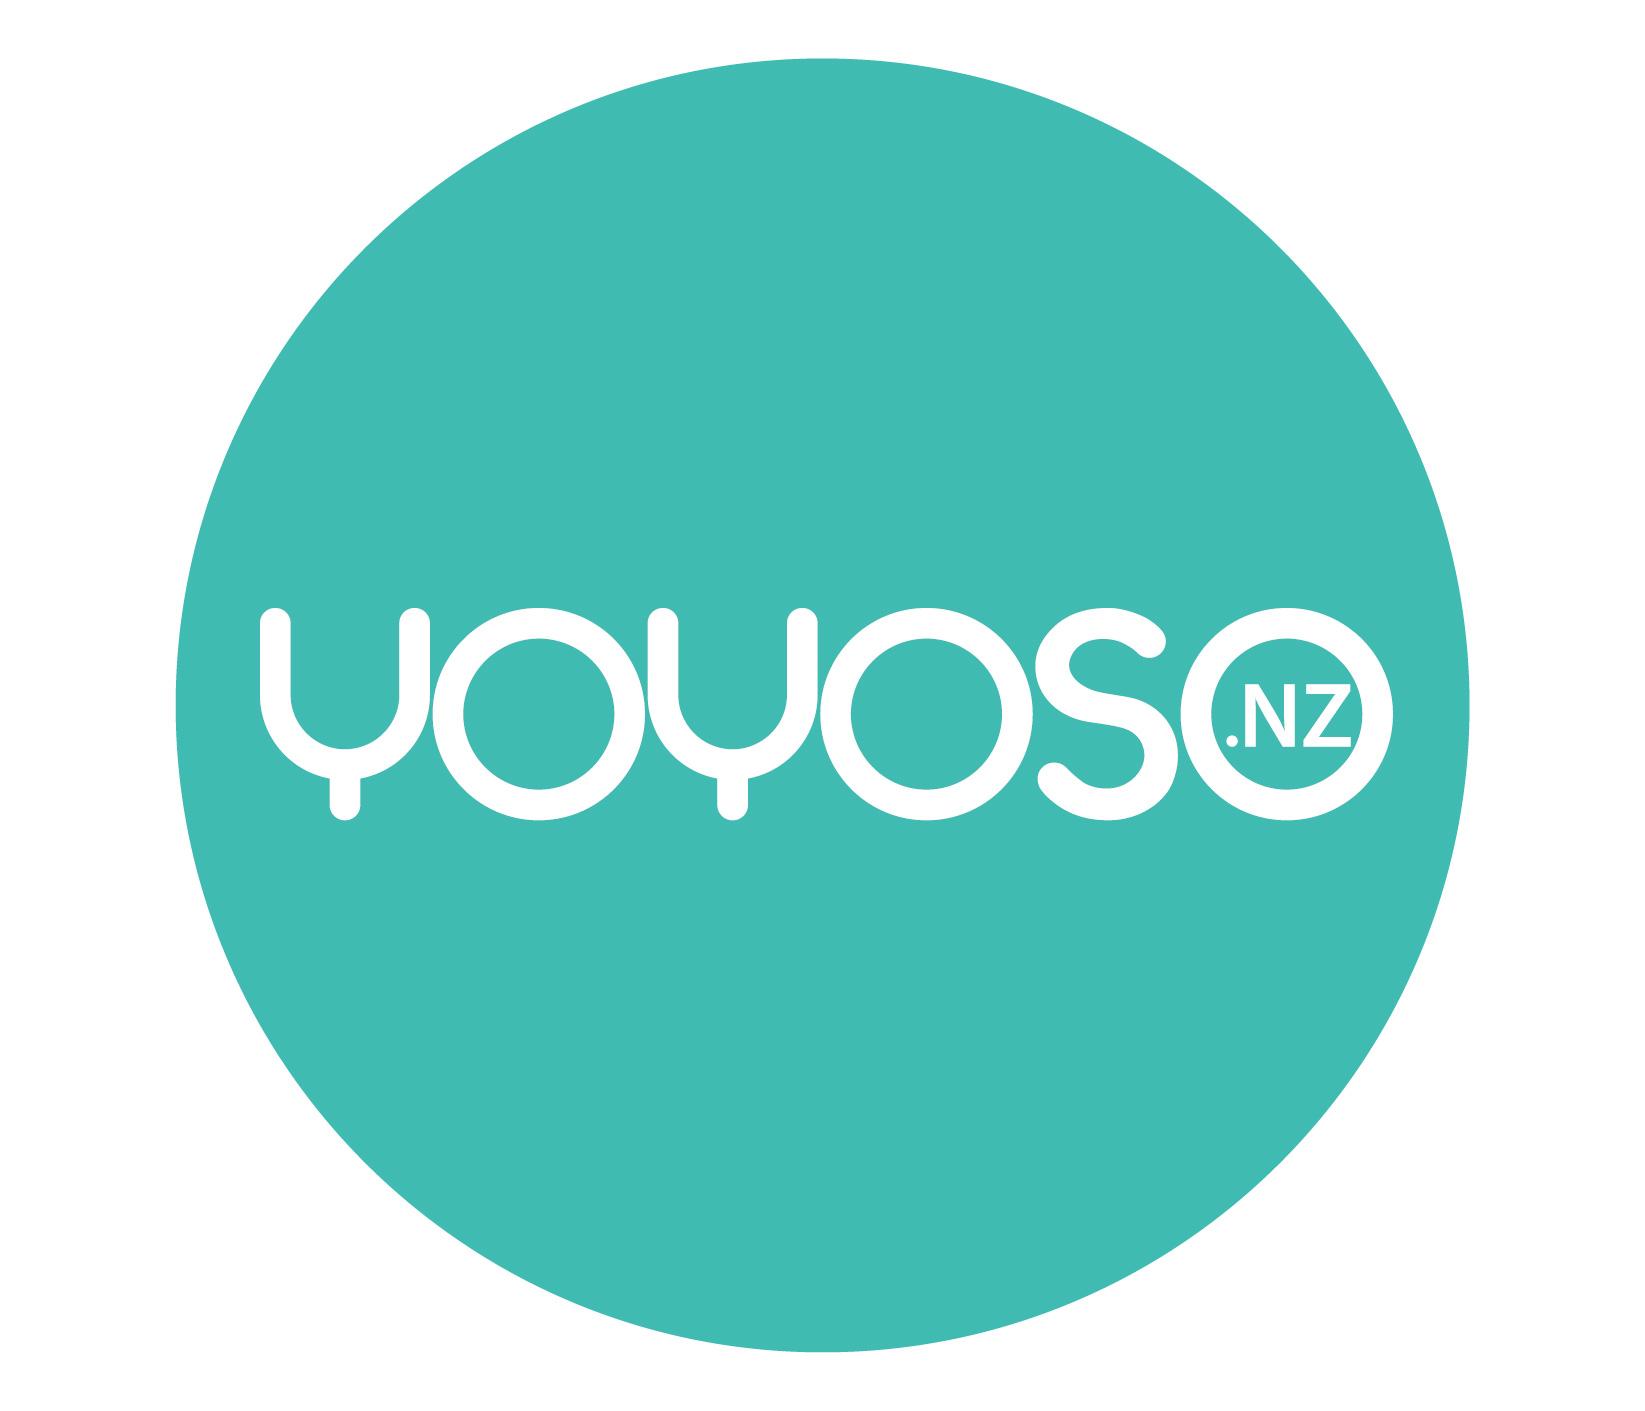 Yoyoso logo